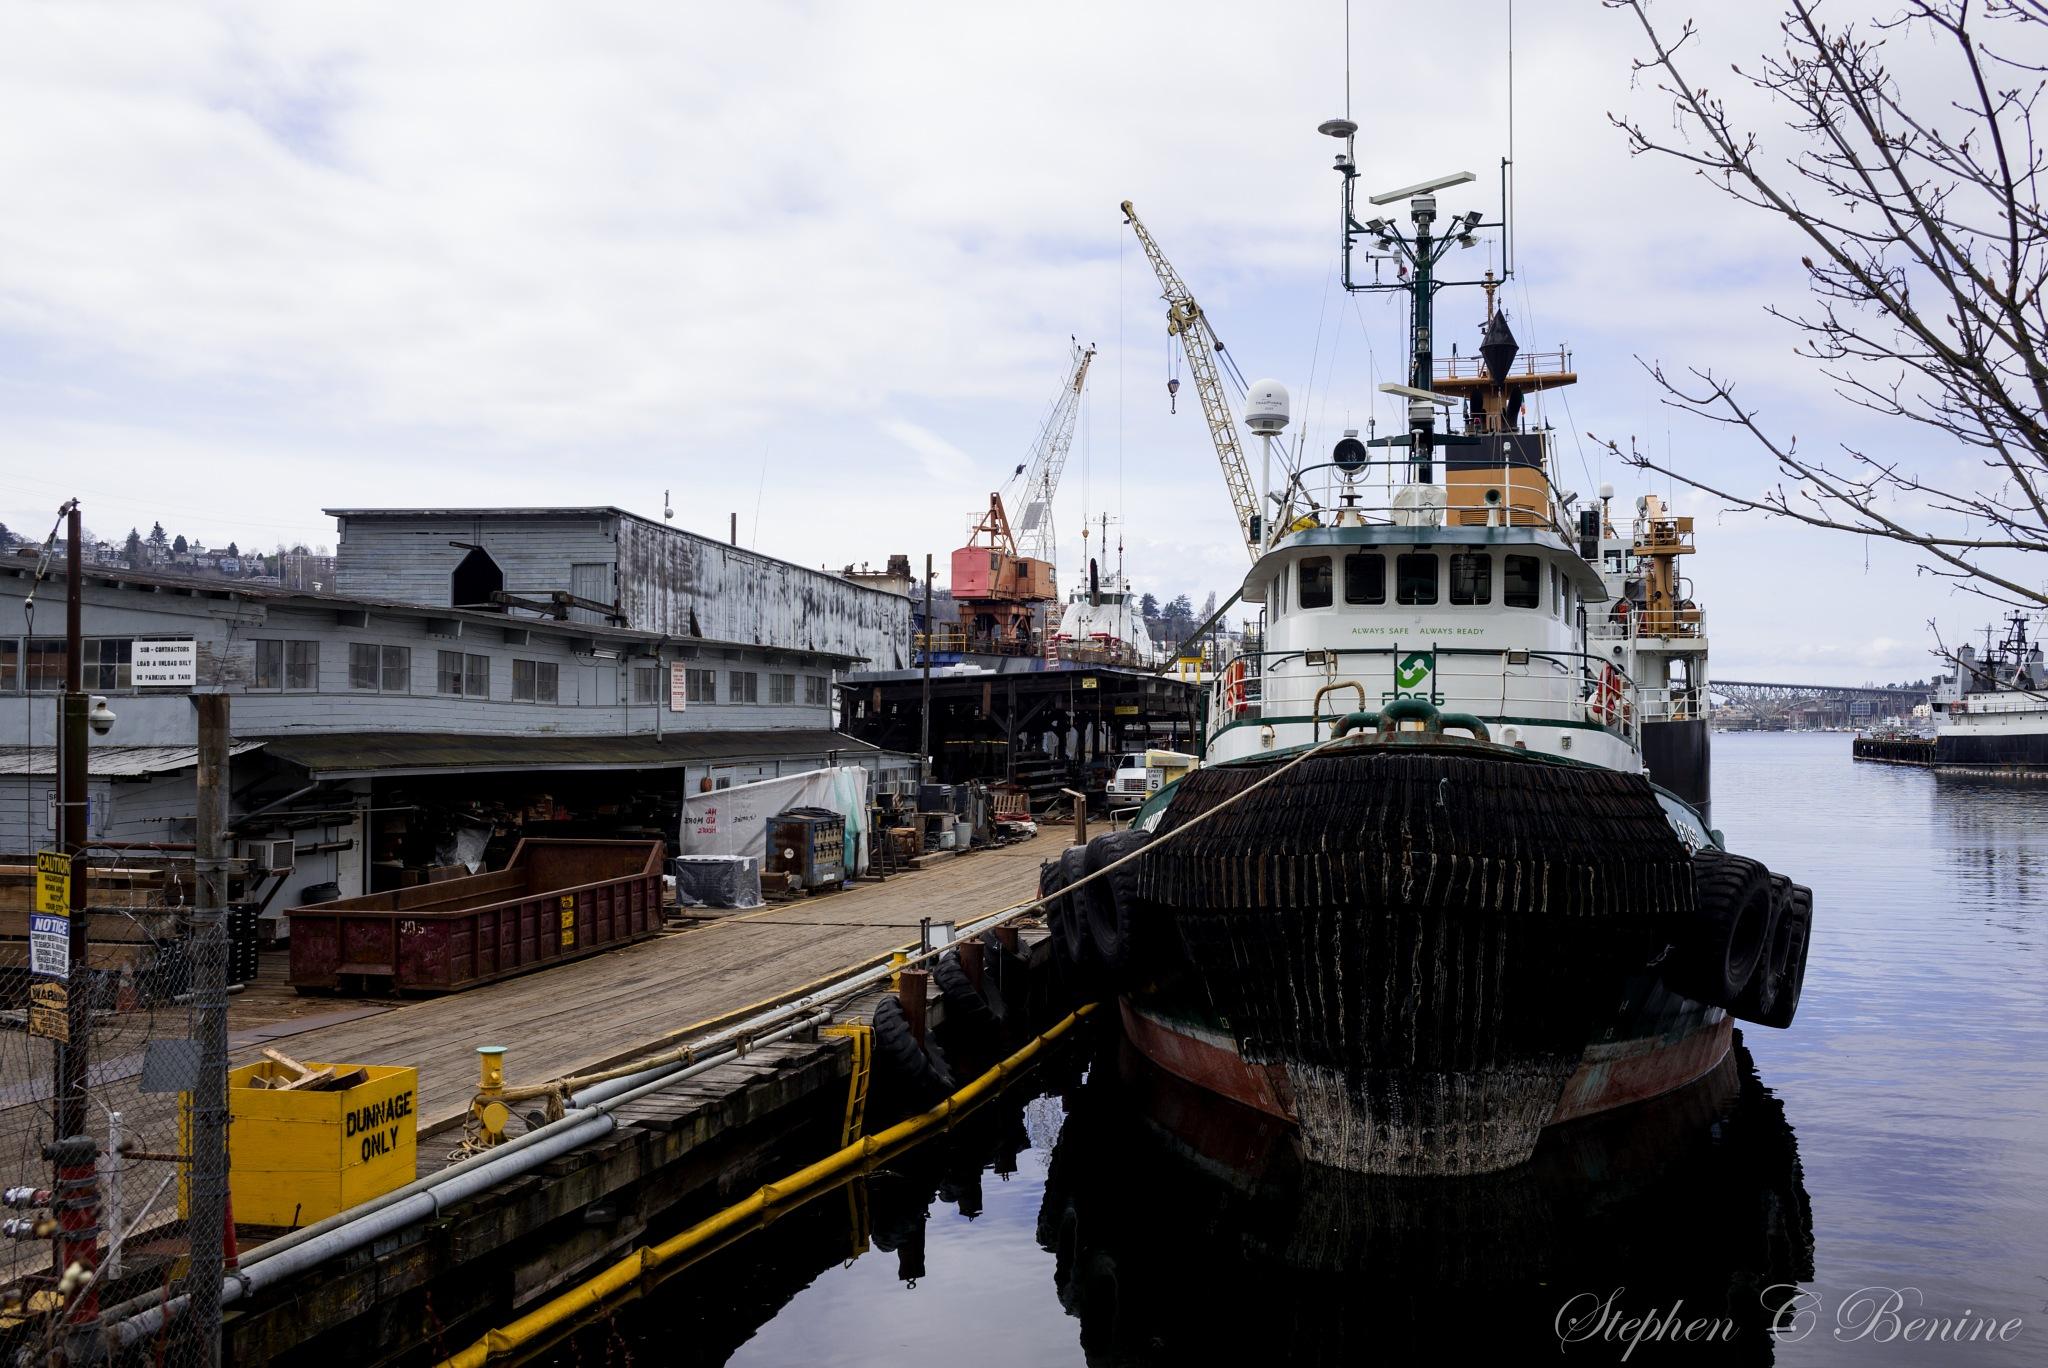 Working Dock by Stephen C. Benine